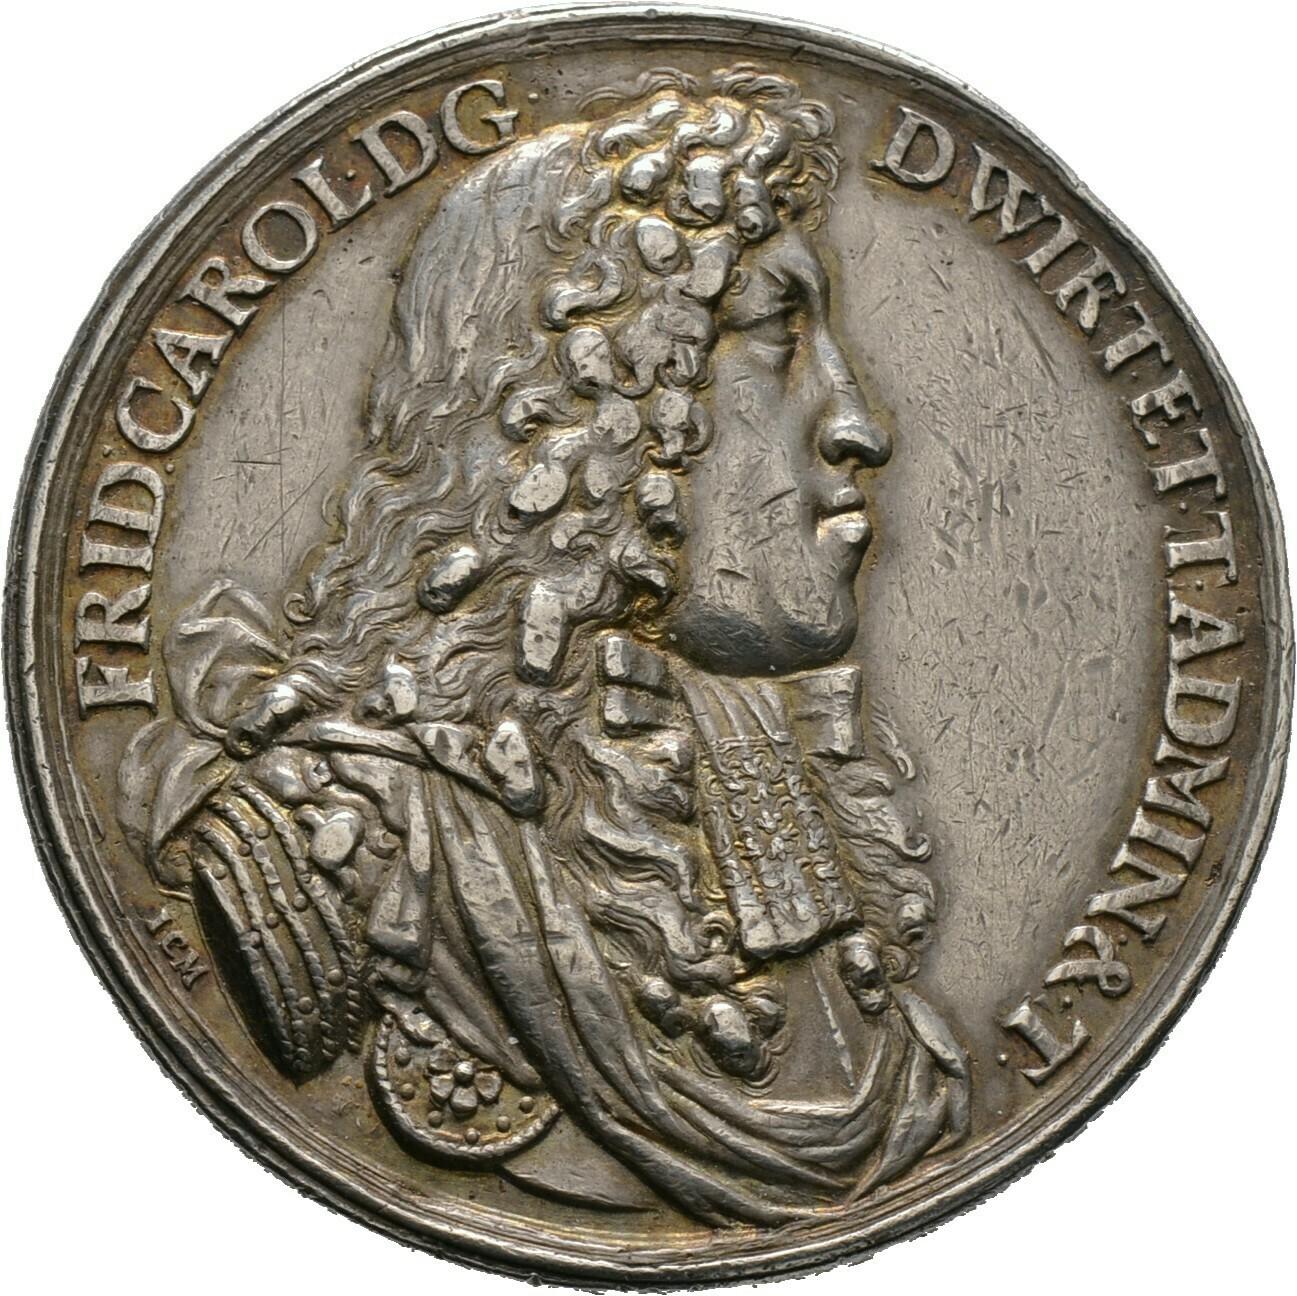 Silberne Hydramedaille o.J., Württemberg